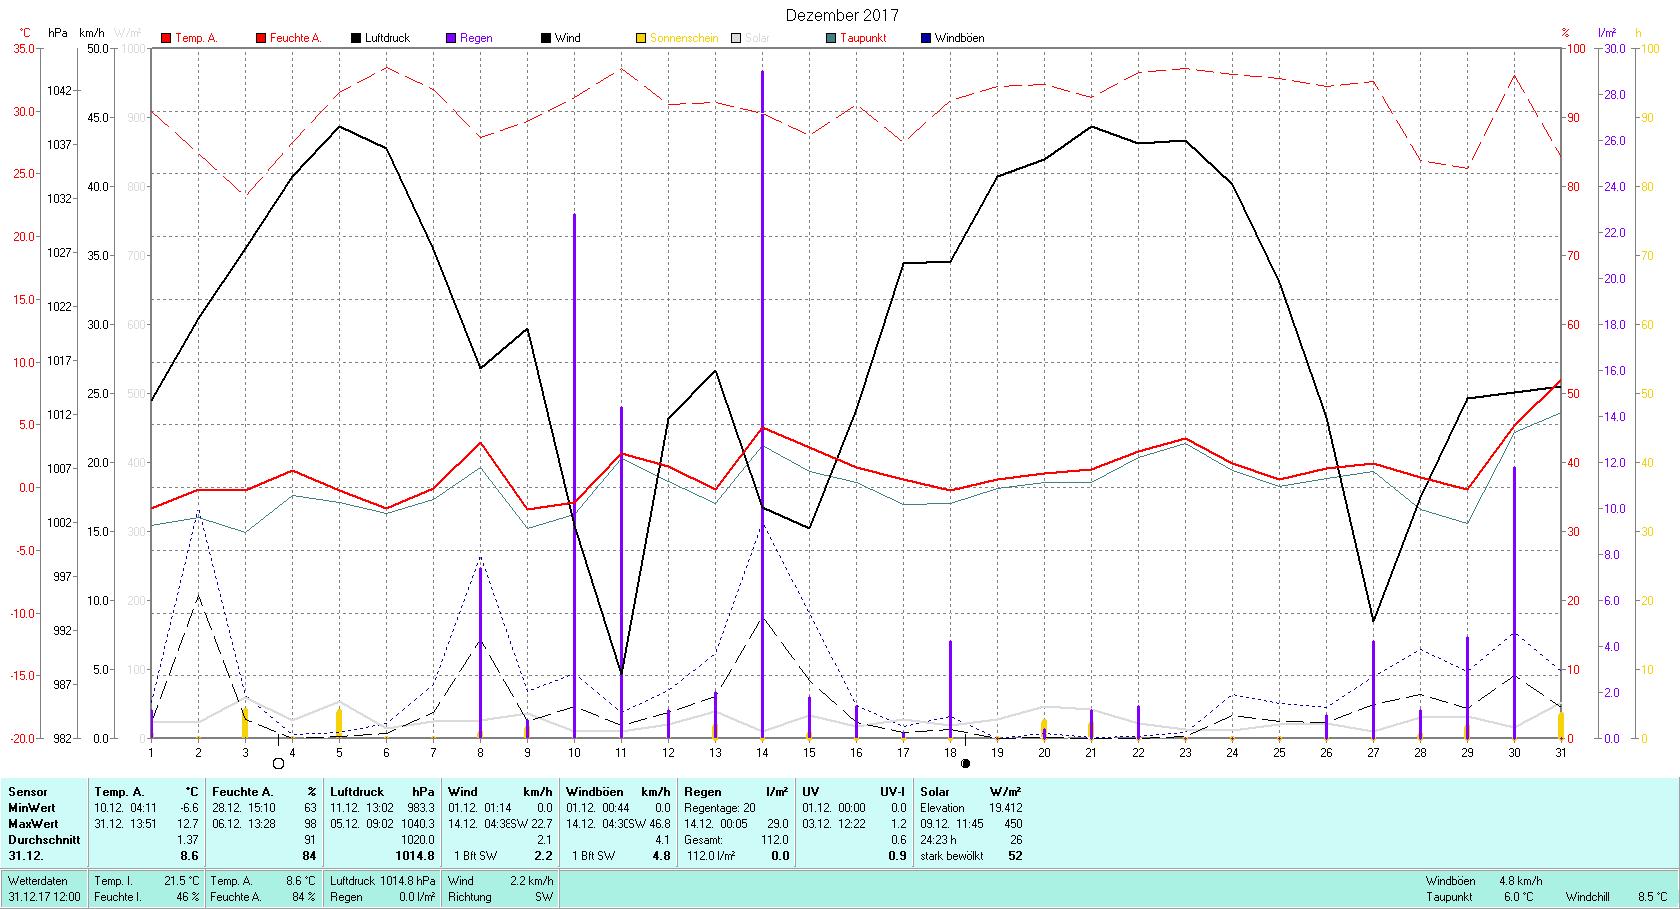 Dezember 2017 Tmin -6.6°C, Tmax 12.7°C, Sonne 24:23 h, Niederschlag 112.0mm/2